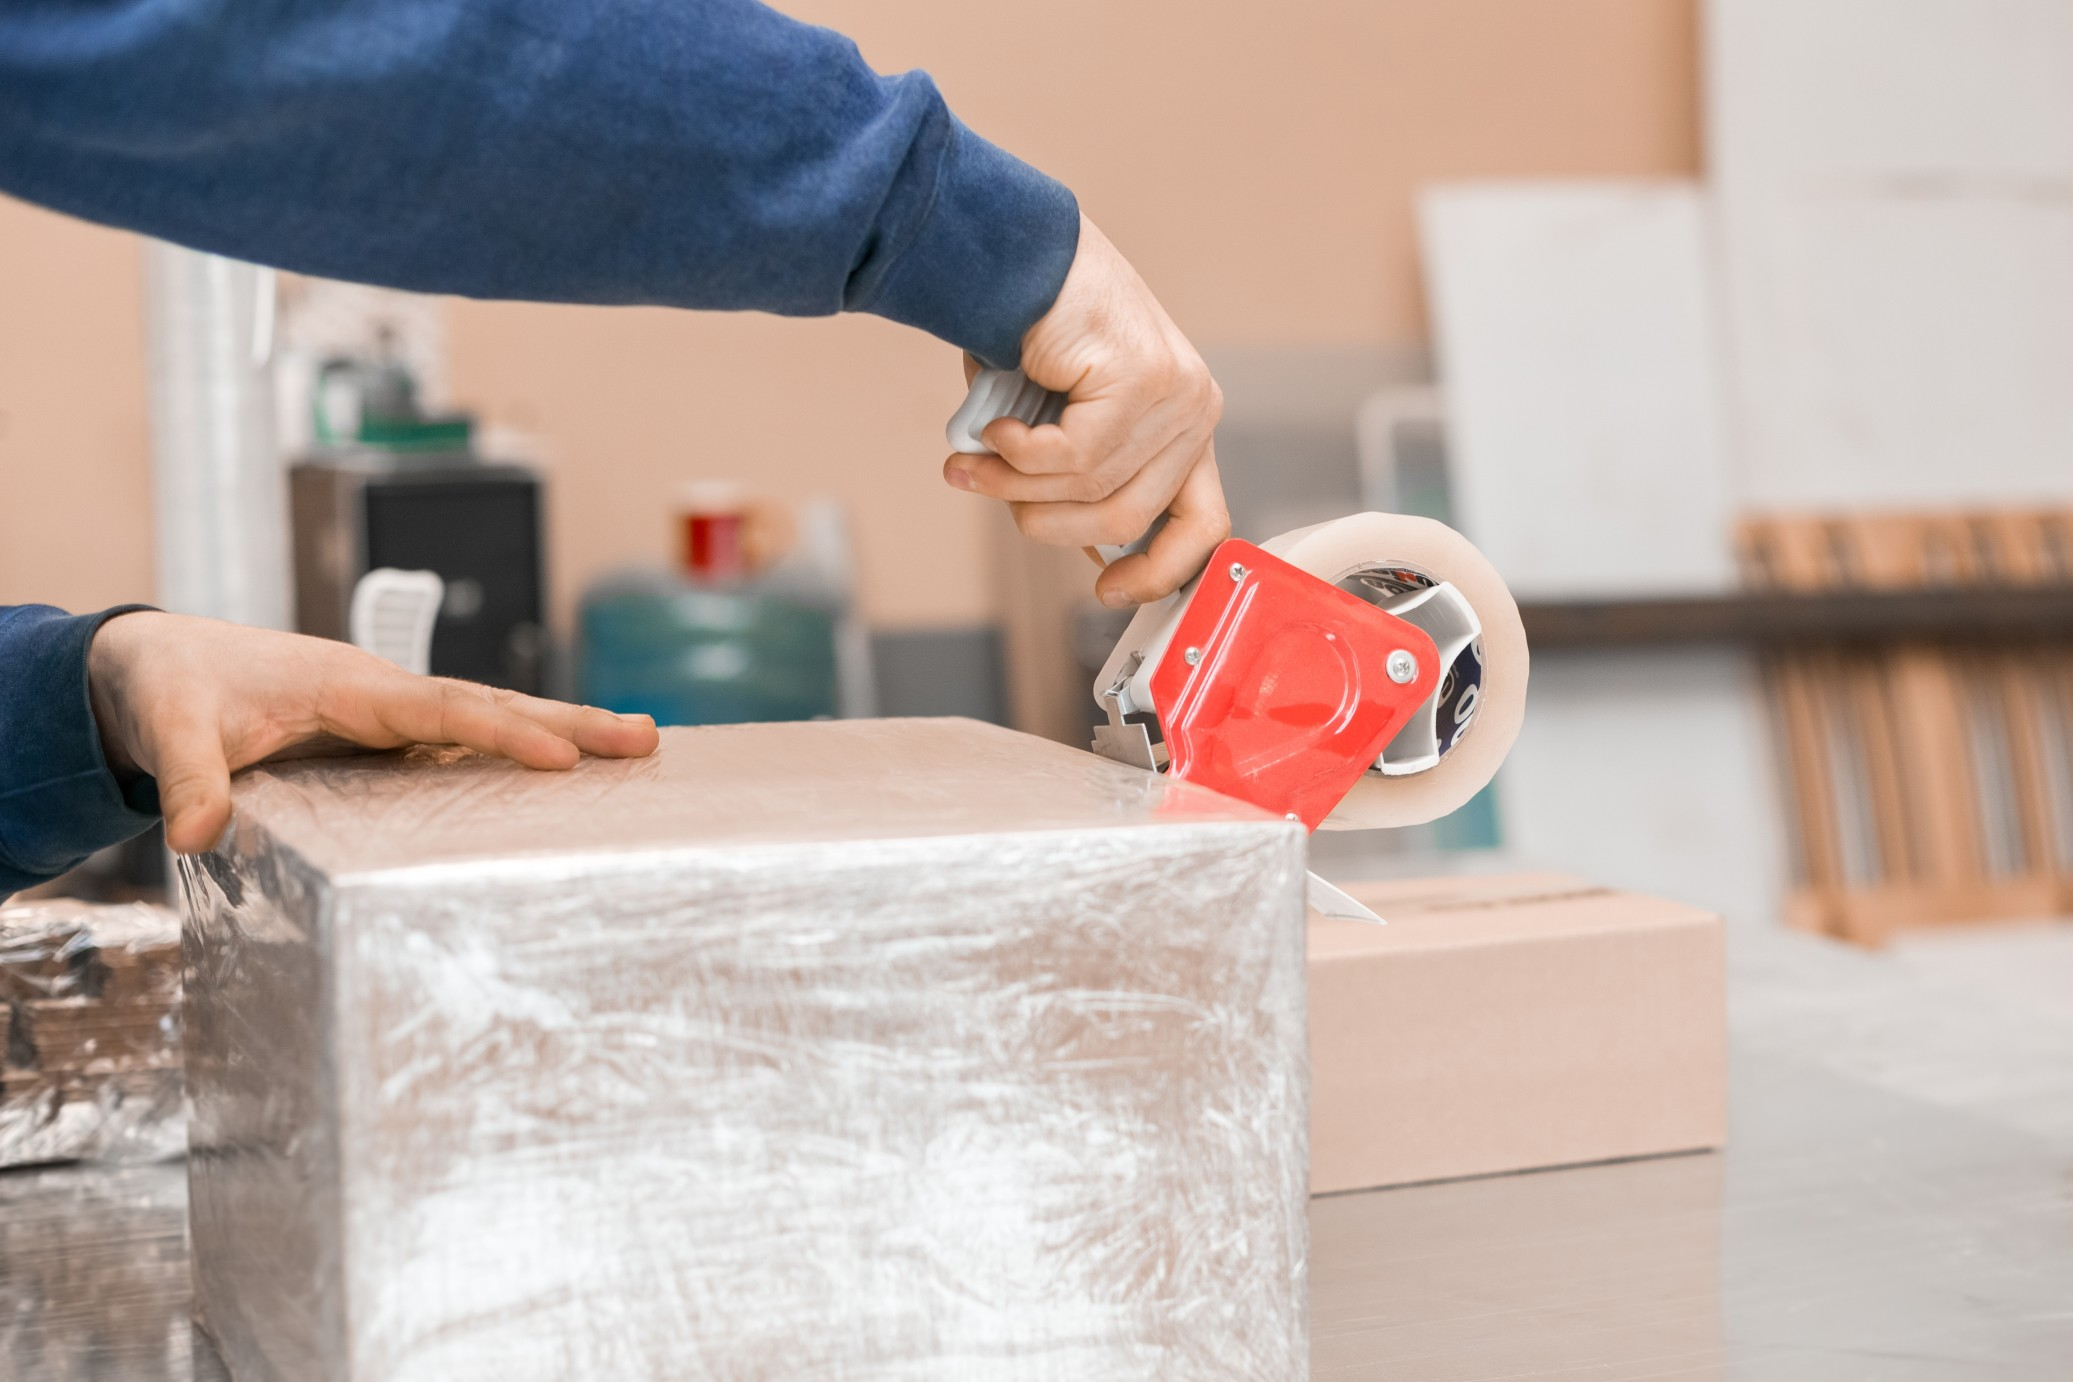 packaging manufacturer reduces waste